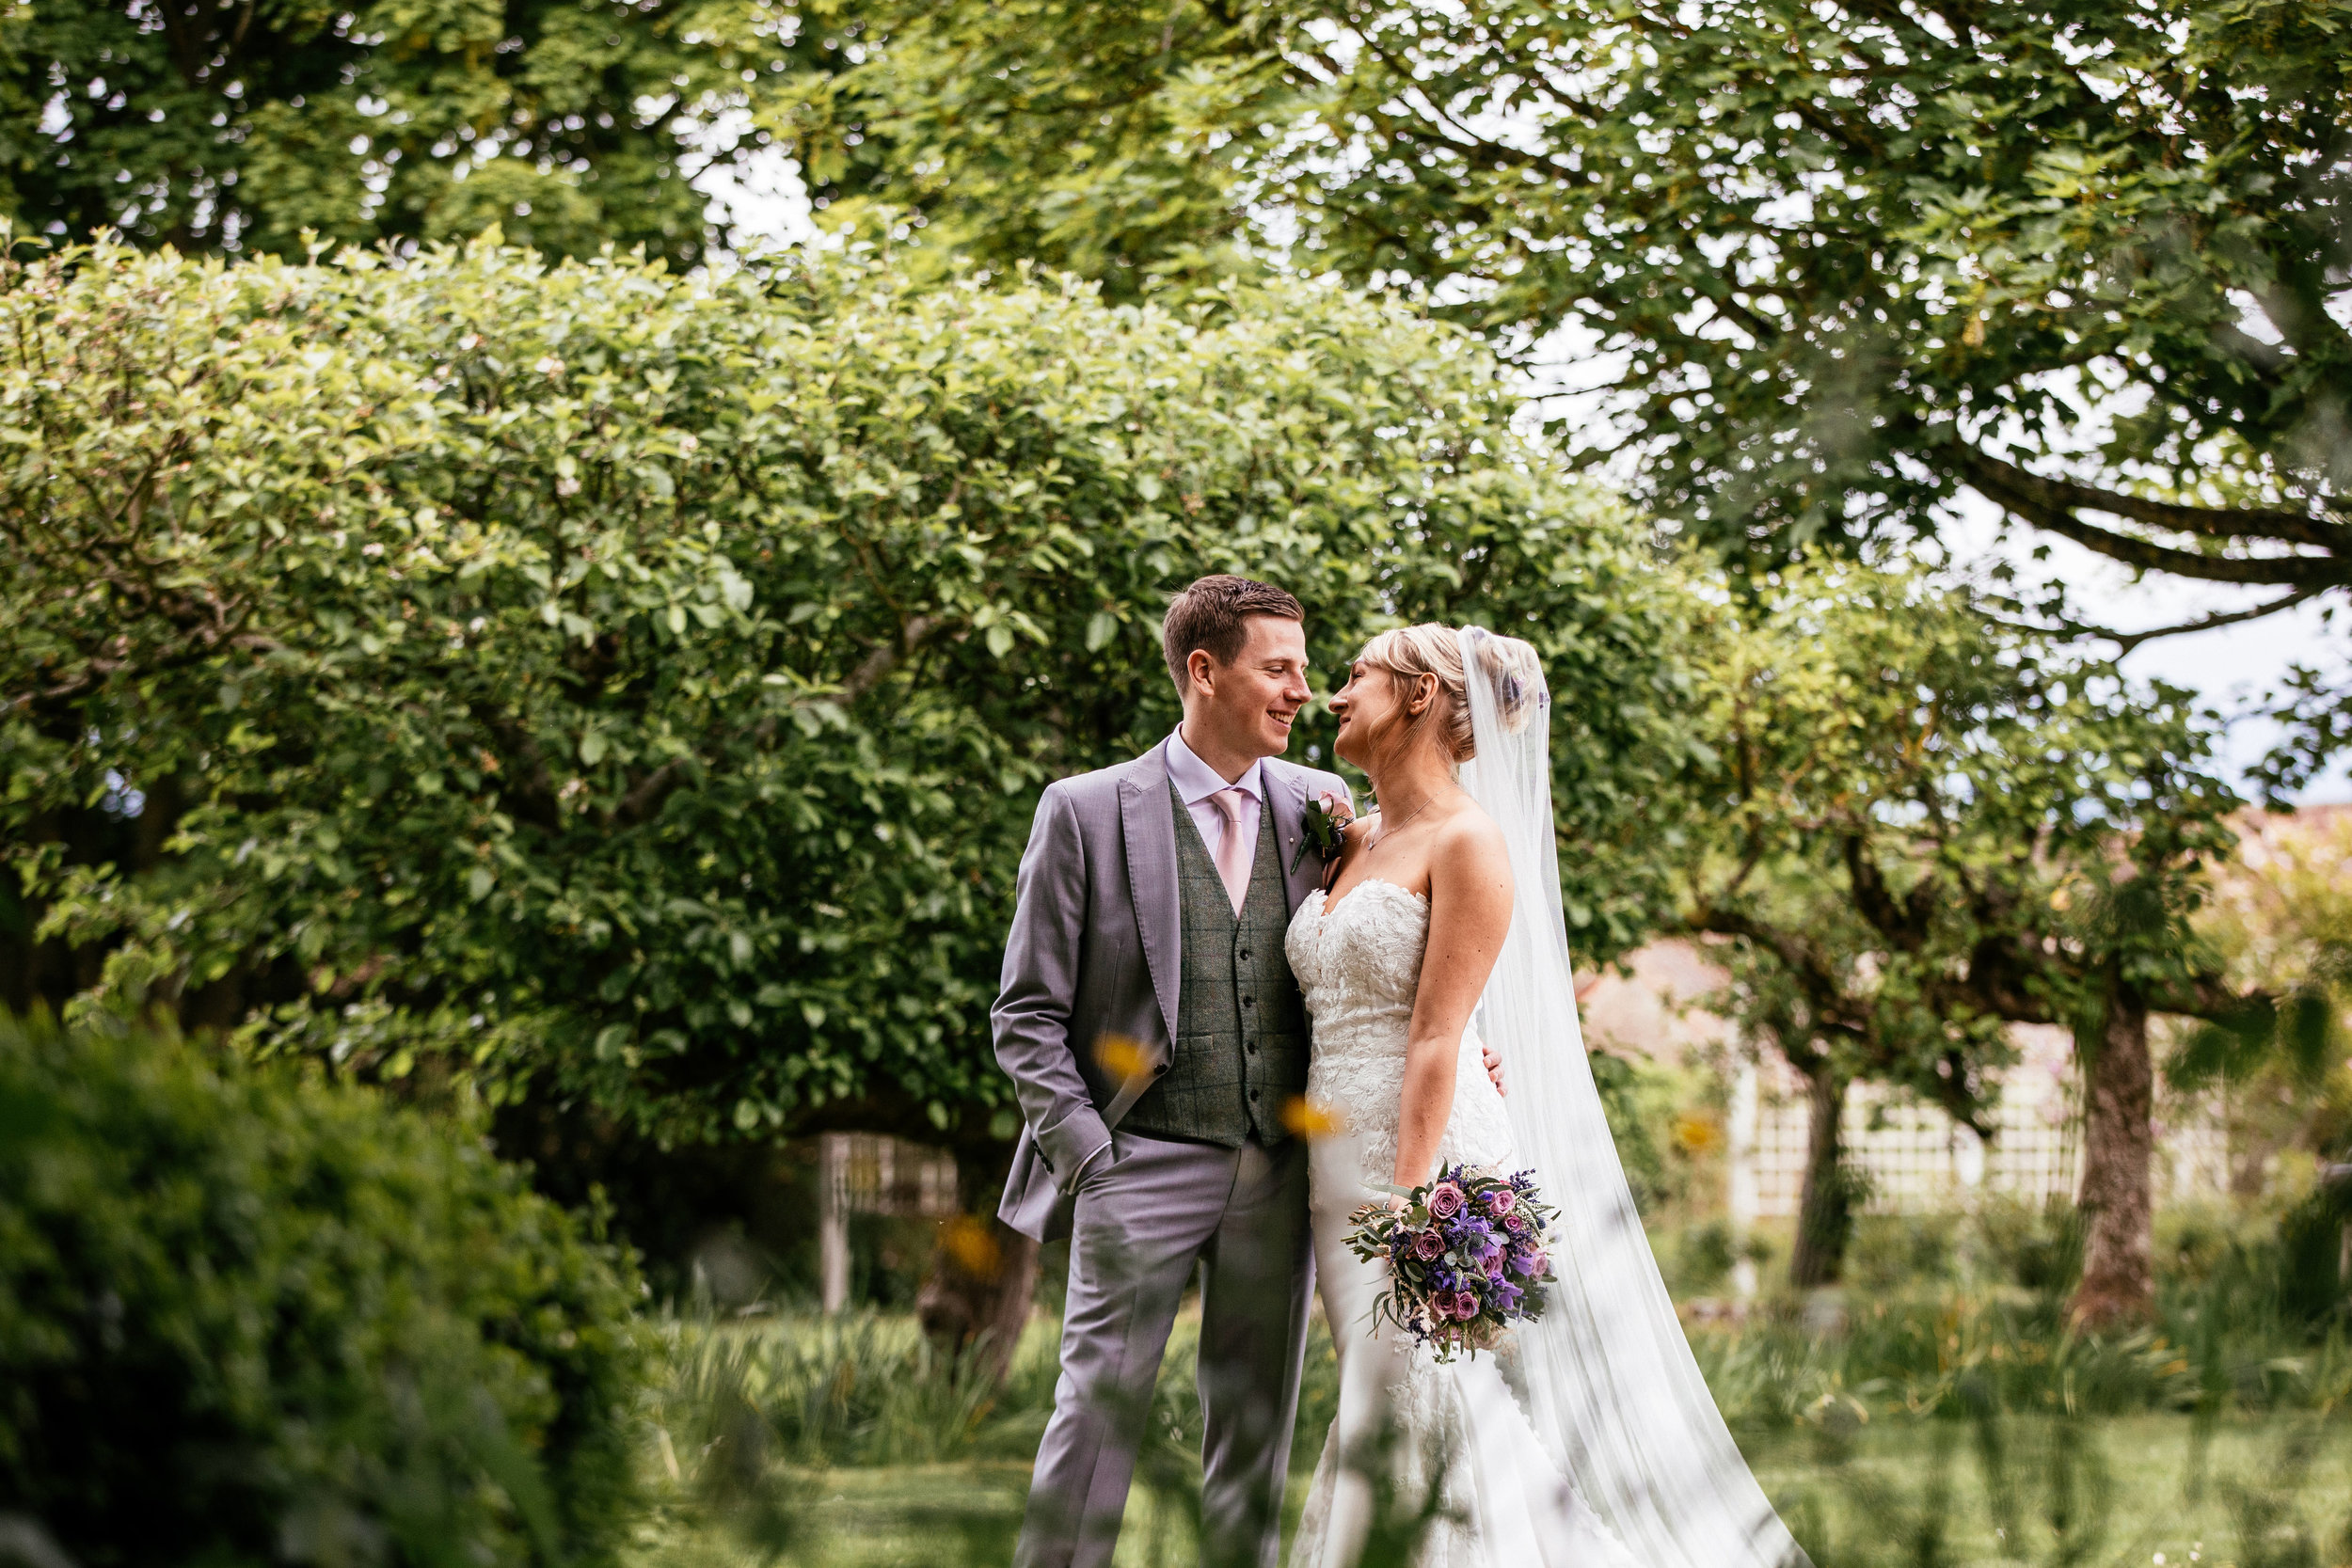 Becky-and-Sam-Wedding-Highlights-51.jpg